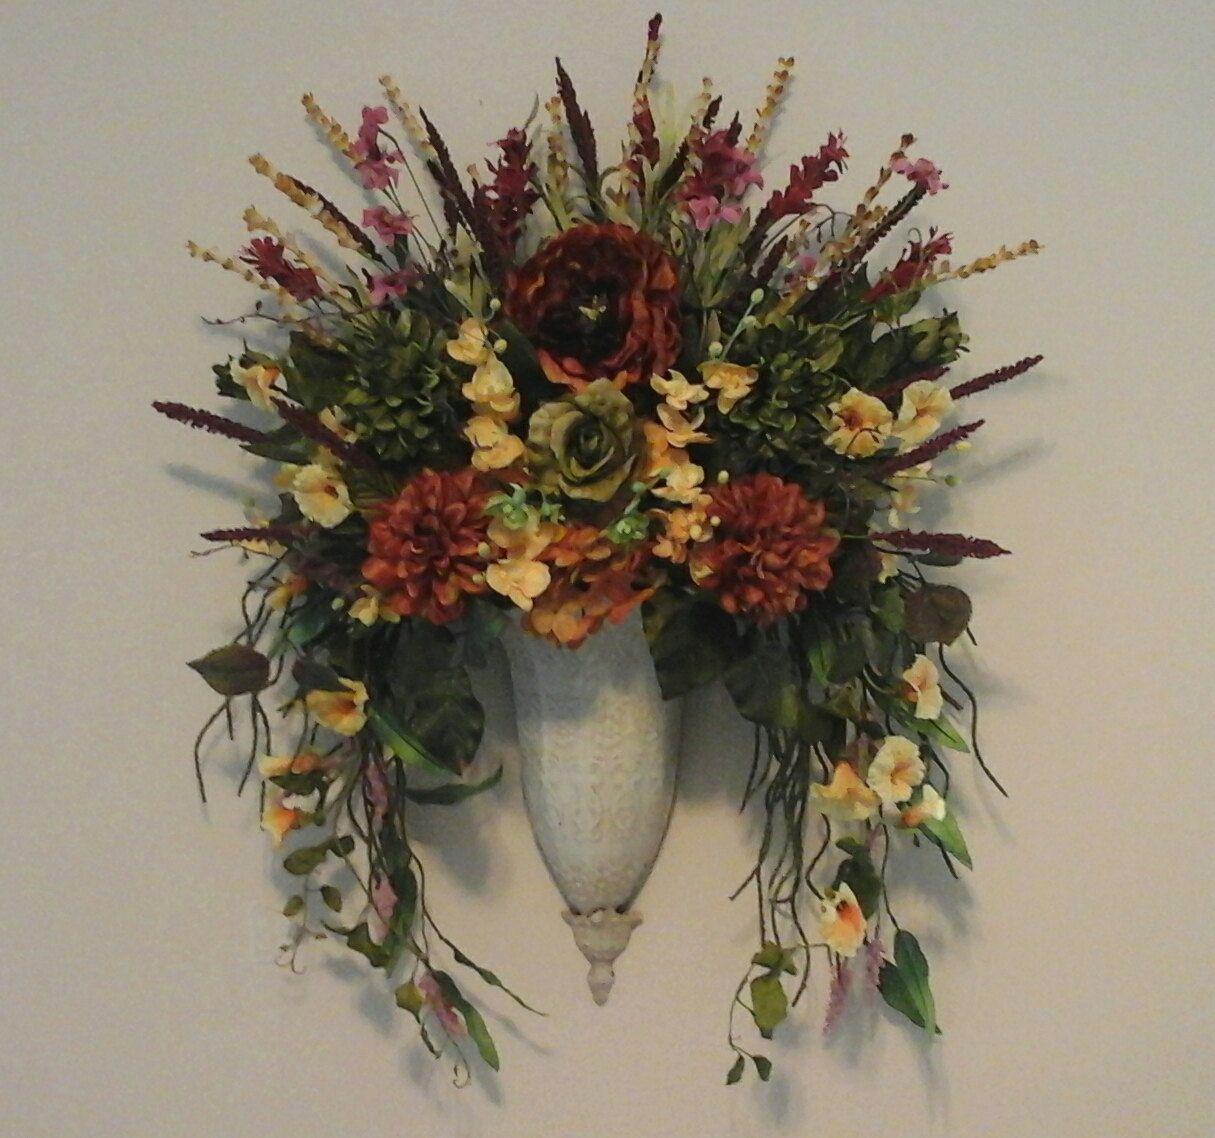 Tuscan Floral Wall Sconce, Fall Wall Planter,Wall Pocket